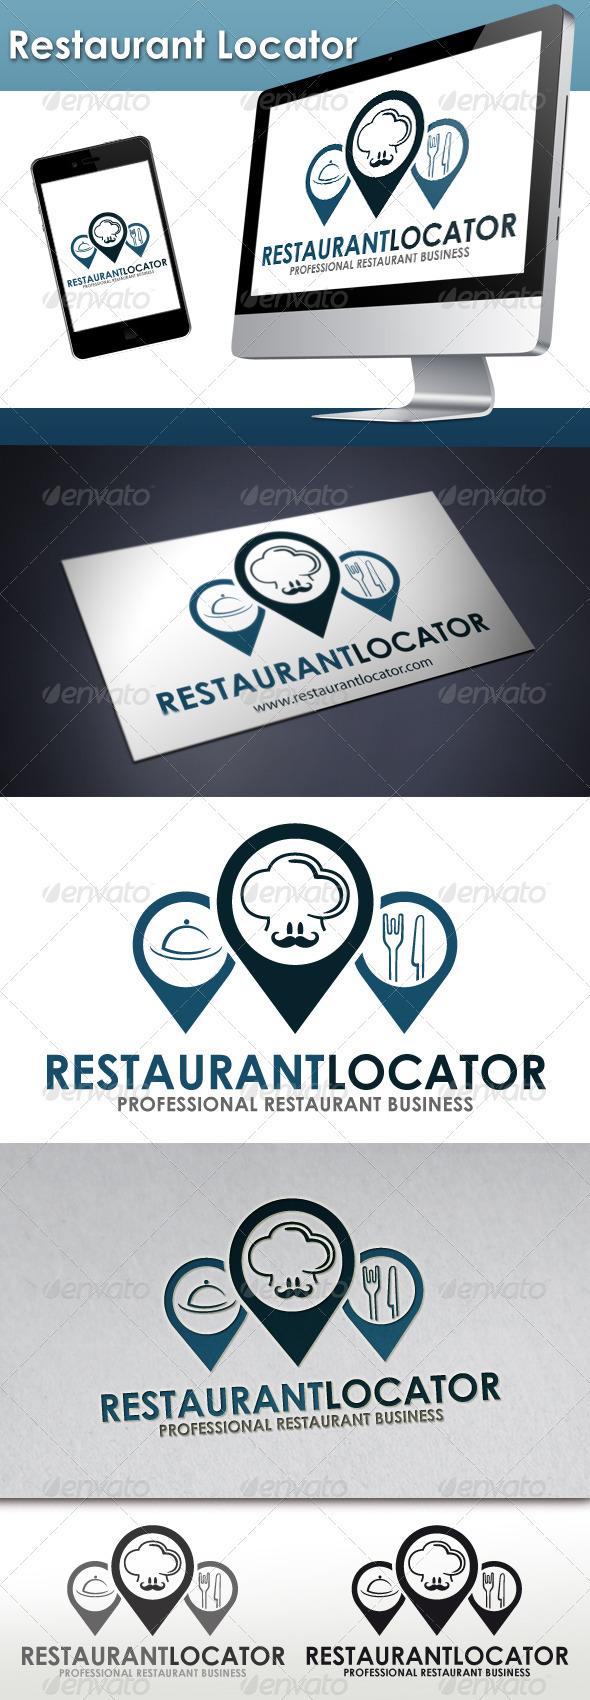 Restaurant Locator Logo - Restaurant Logo Templates